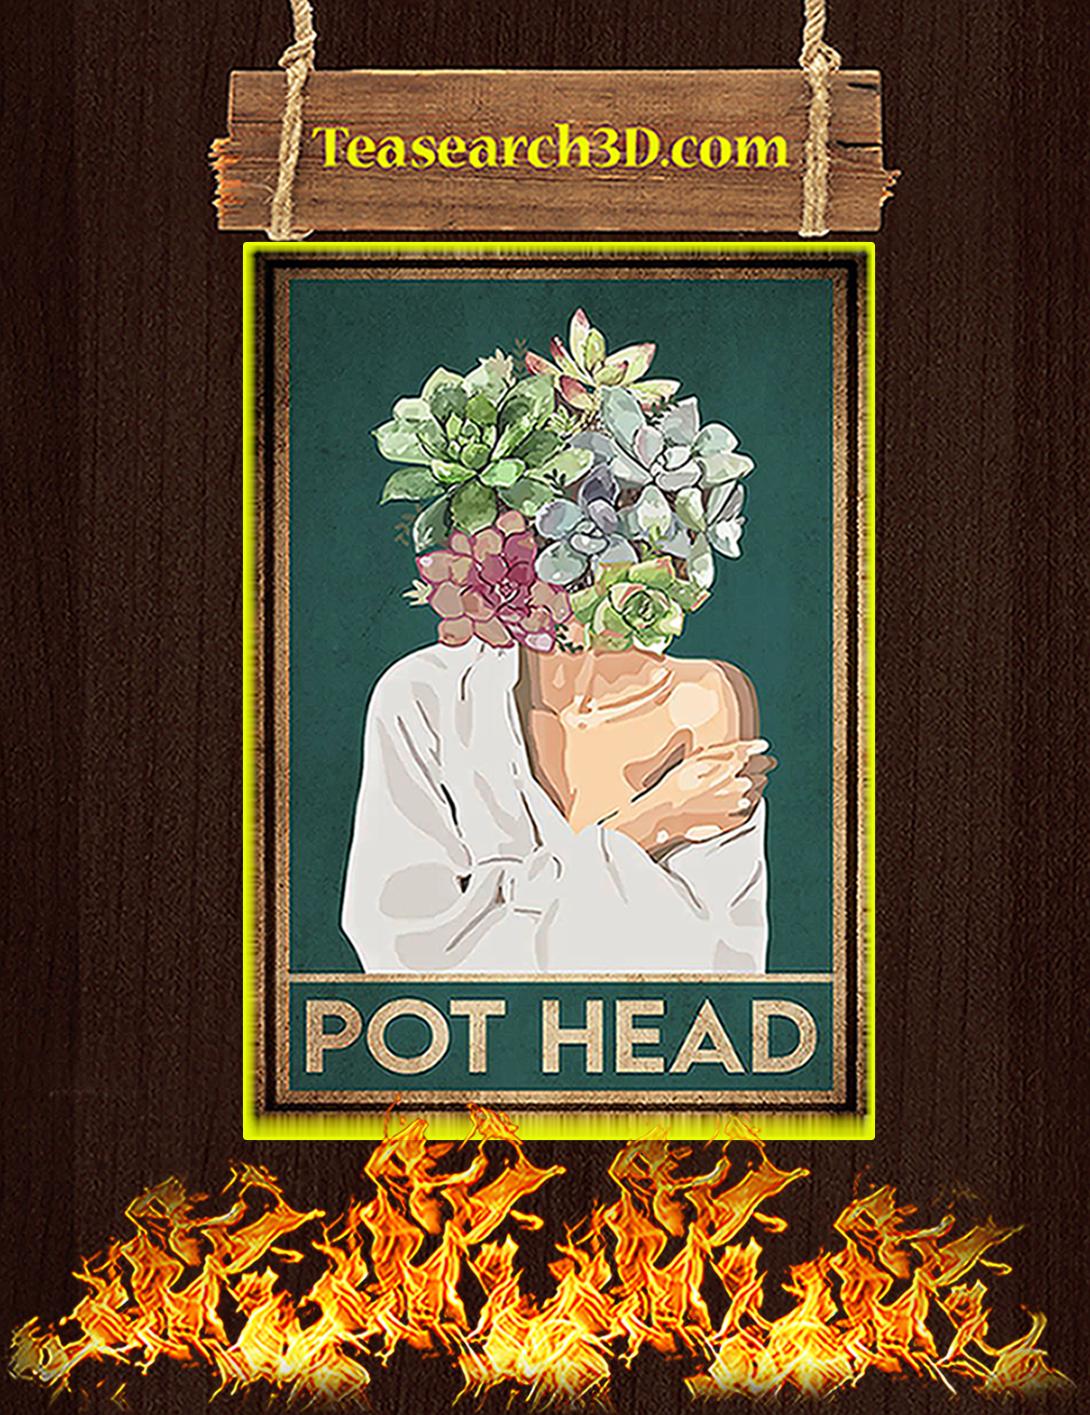 Garden pot head poster A2